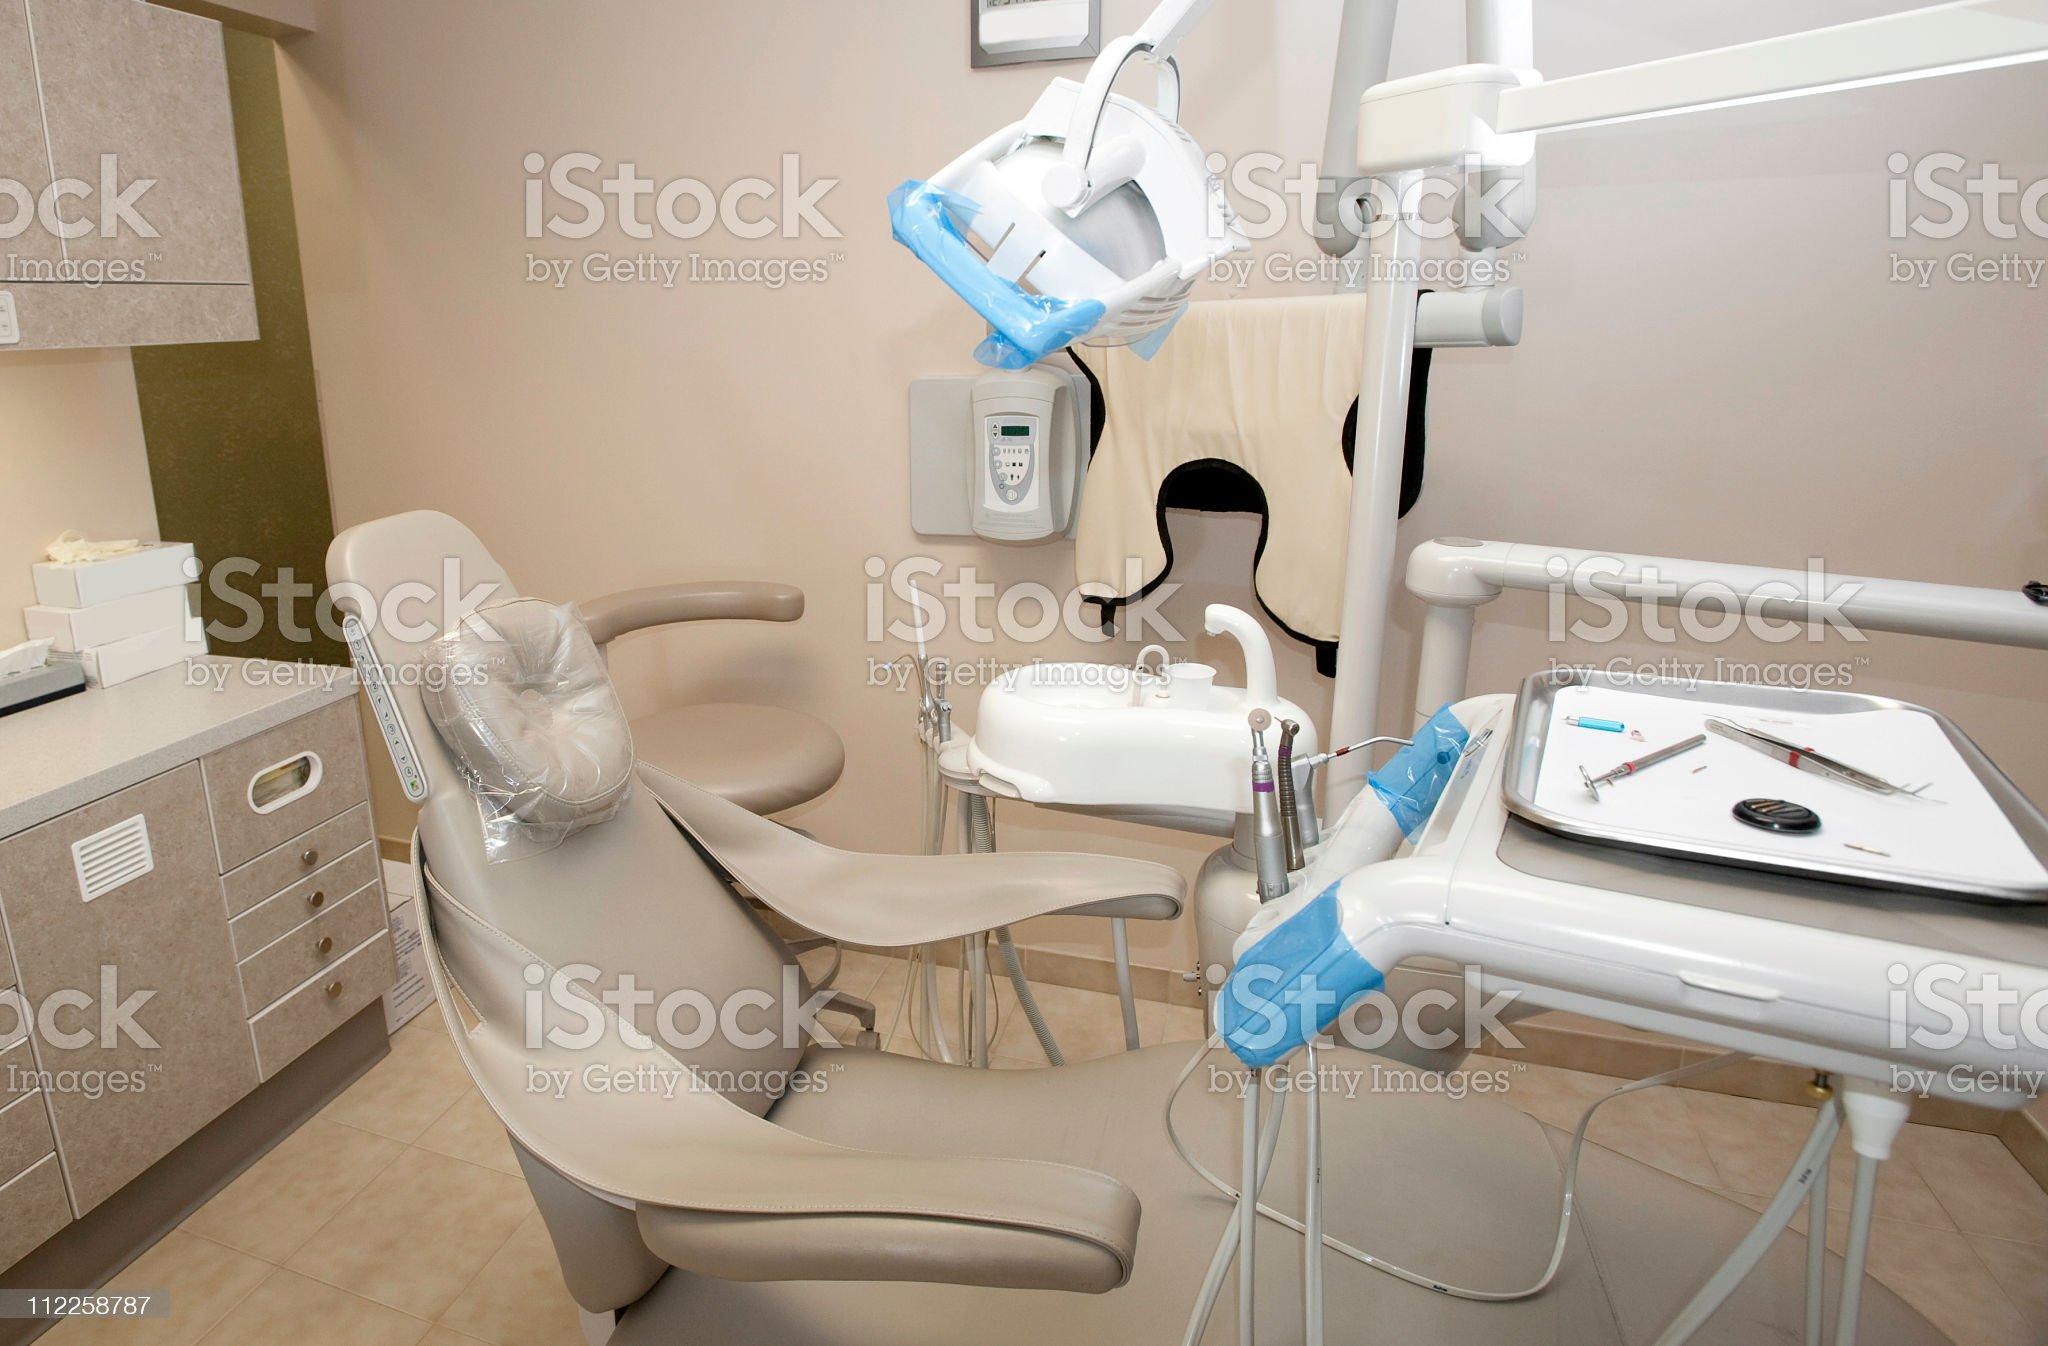 Dental office exam room royalty-free stock photo